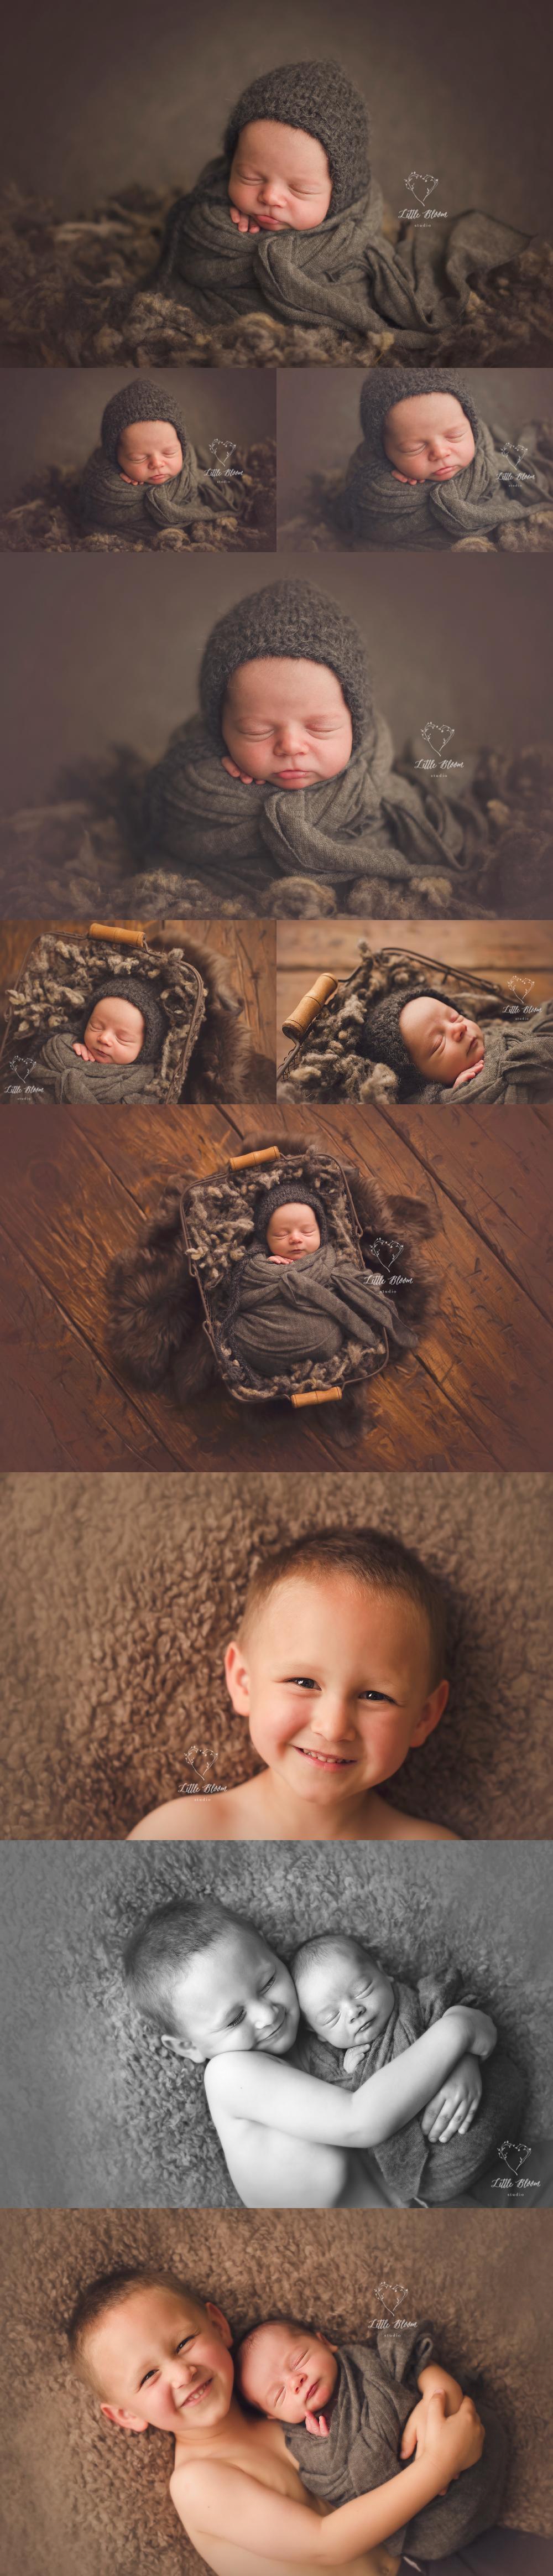 Greenville_newborn_photographer.jpg